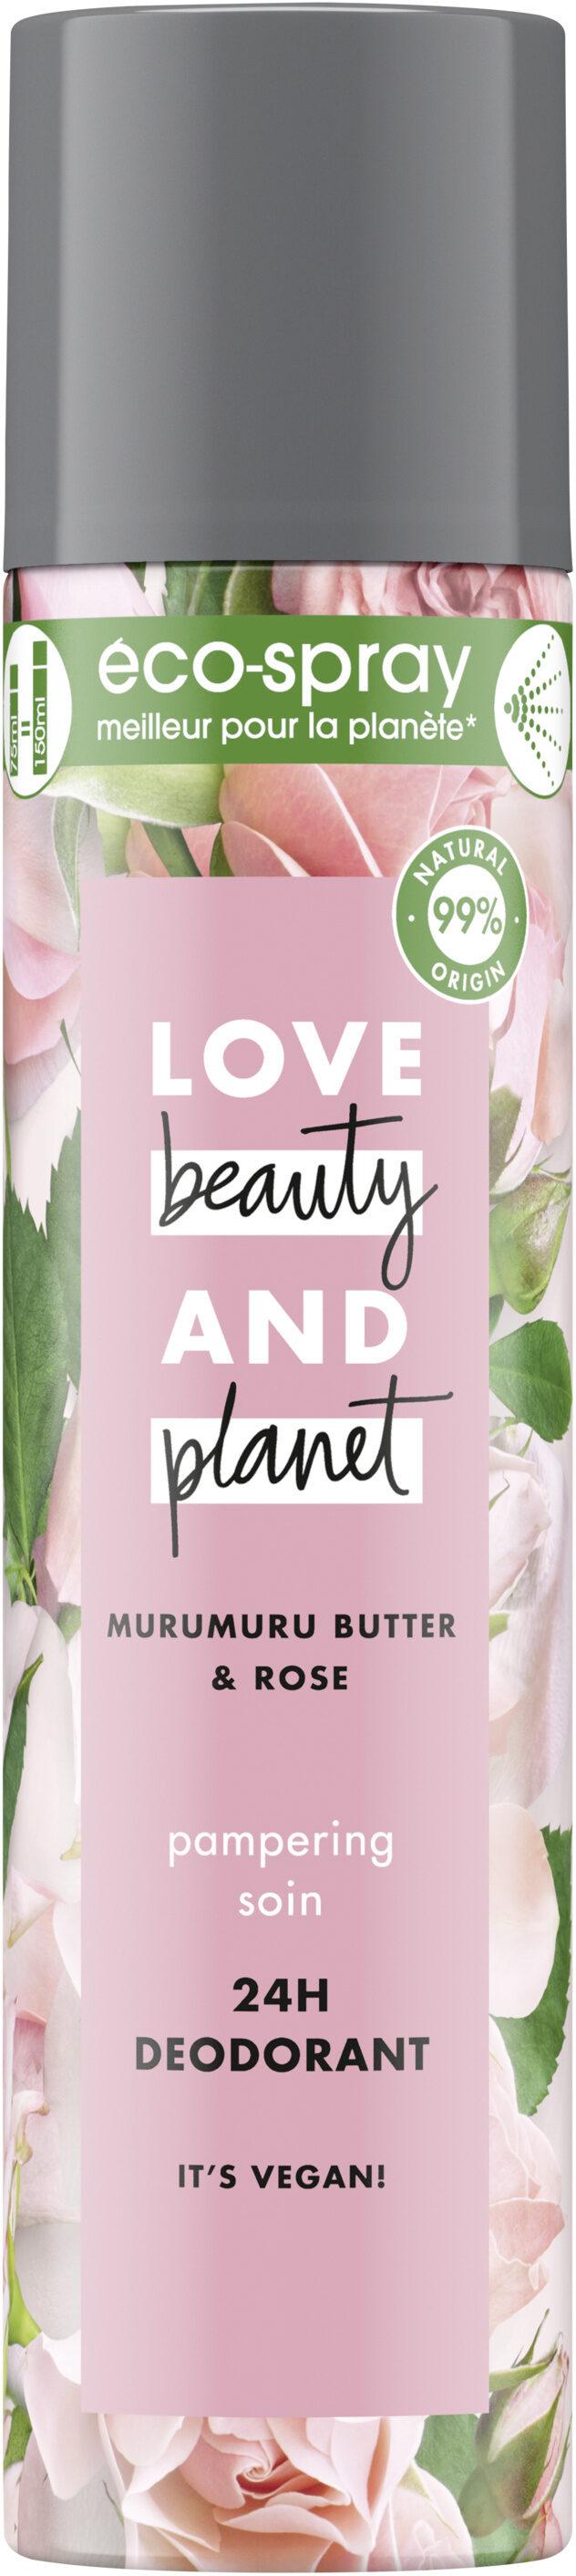 Love Beauty And Planet Déodorant Éco-Spray Soin - Product - fr